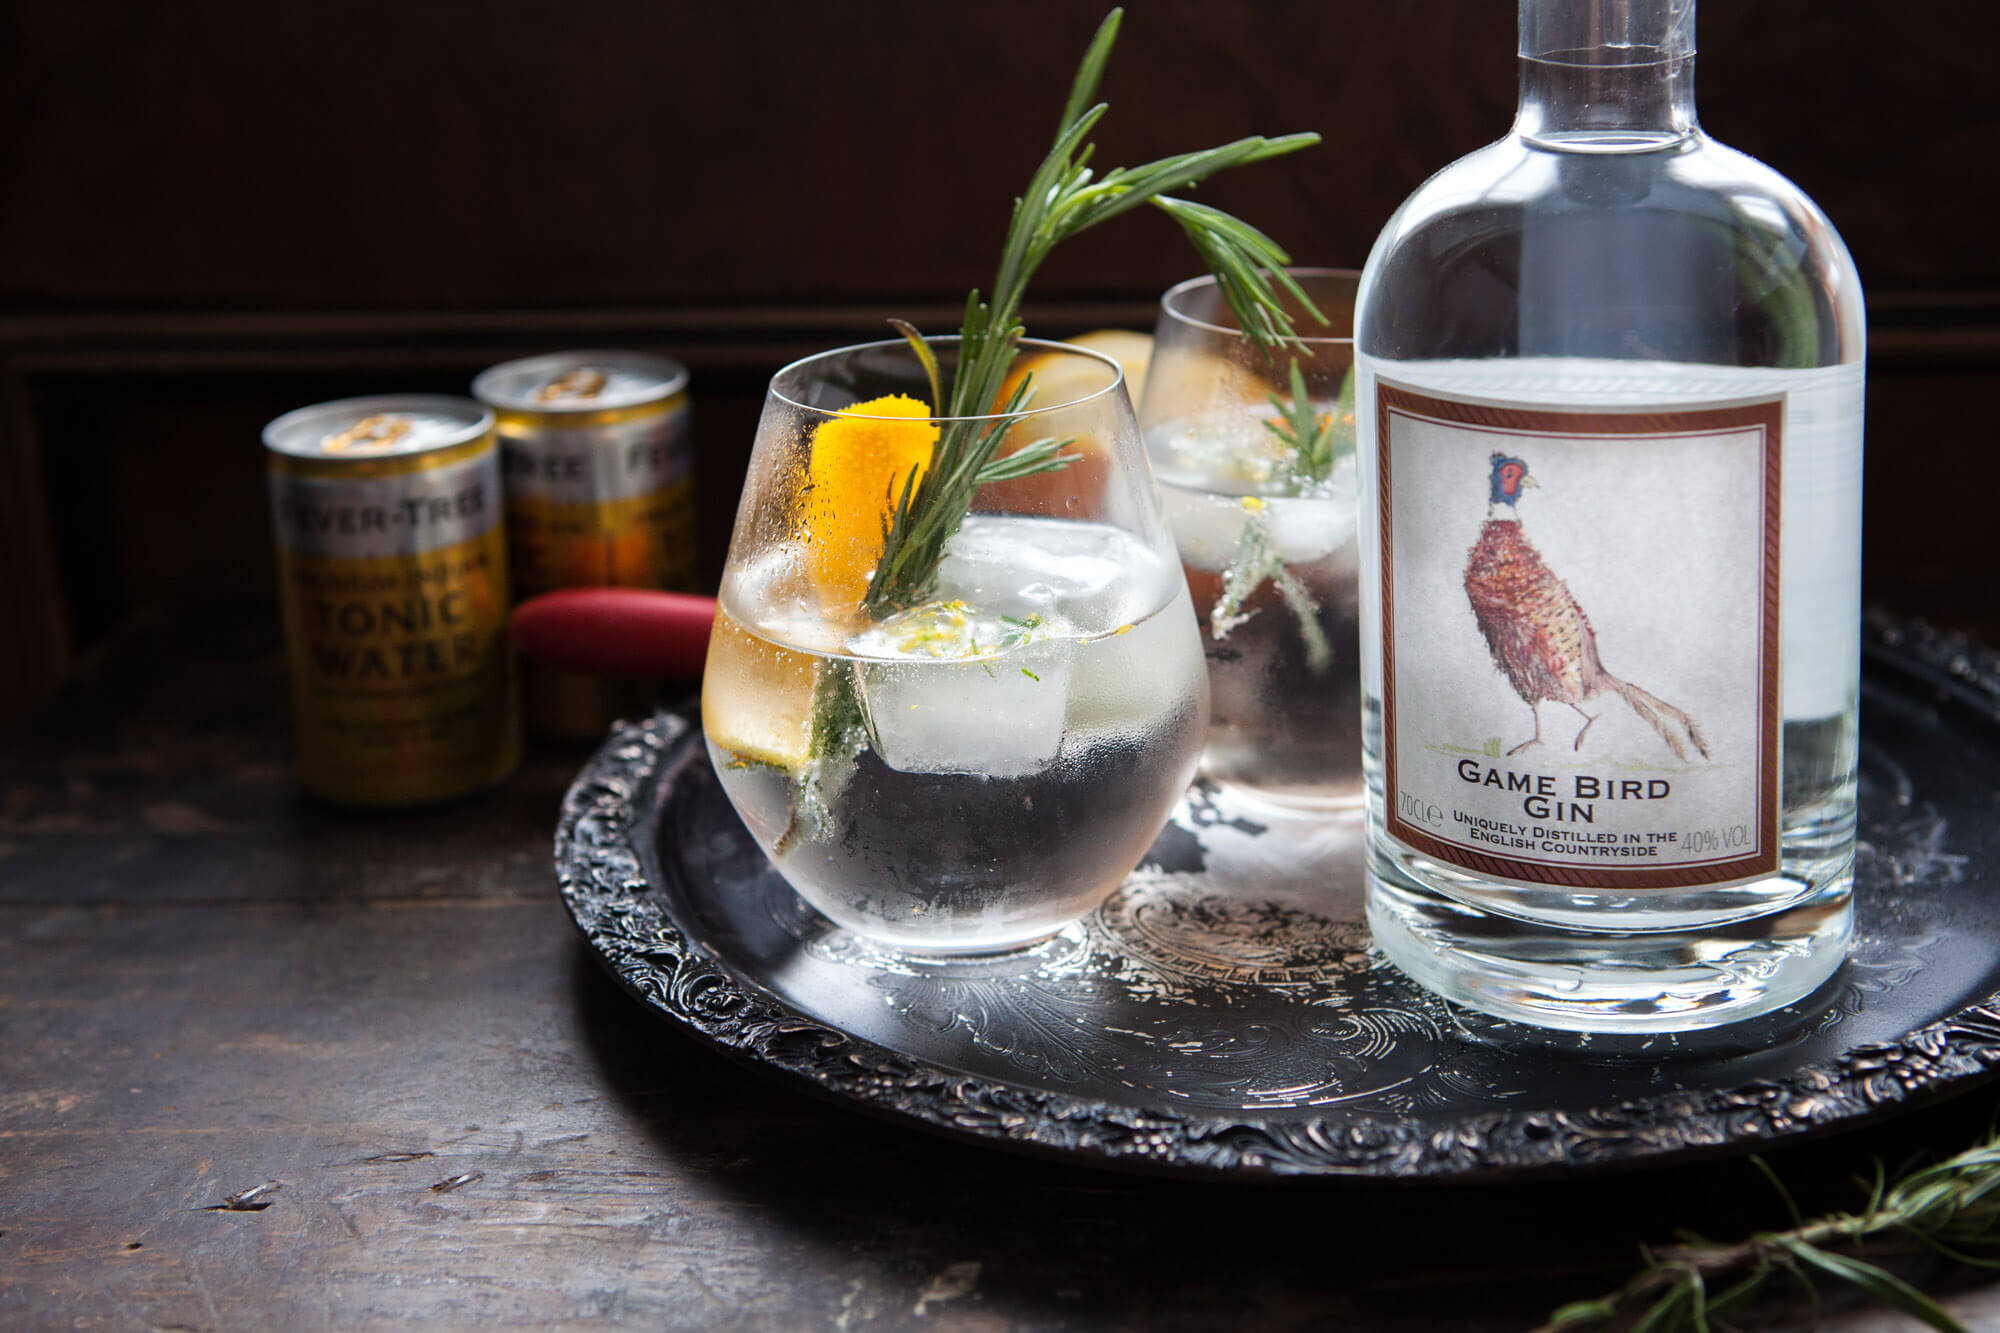 Lara Jane thorpe - product photography dorset -gamebird gin